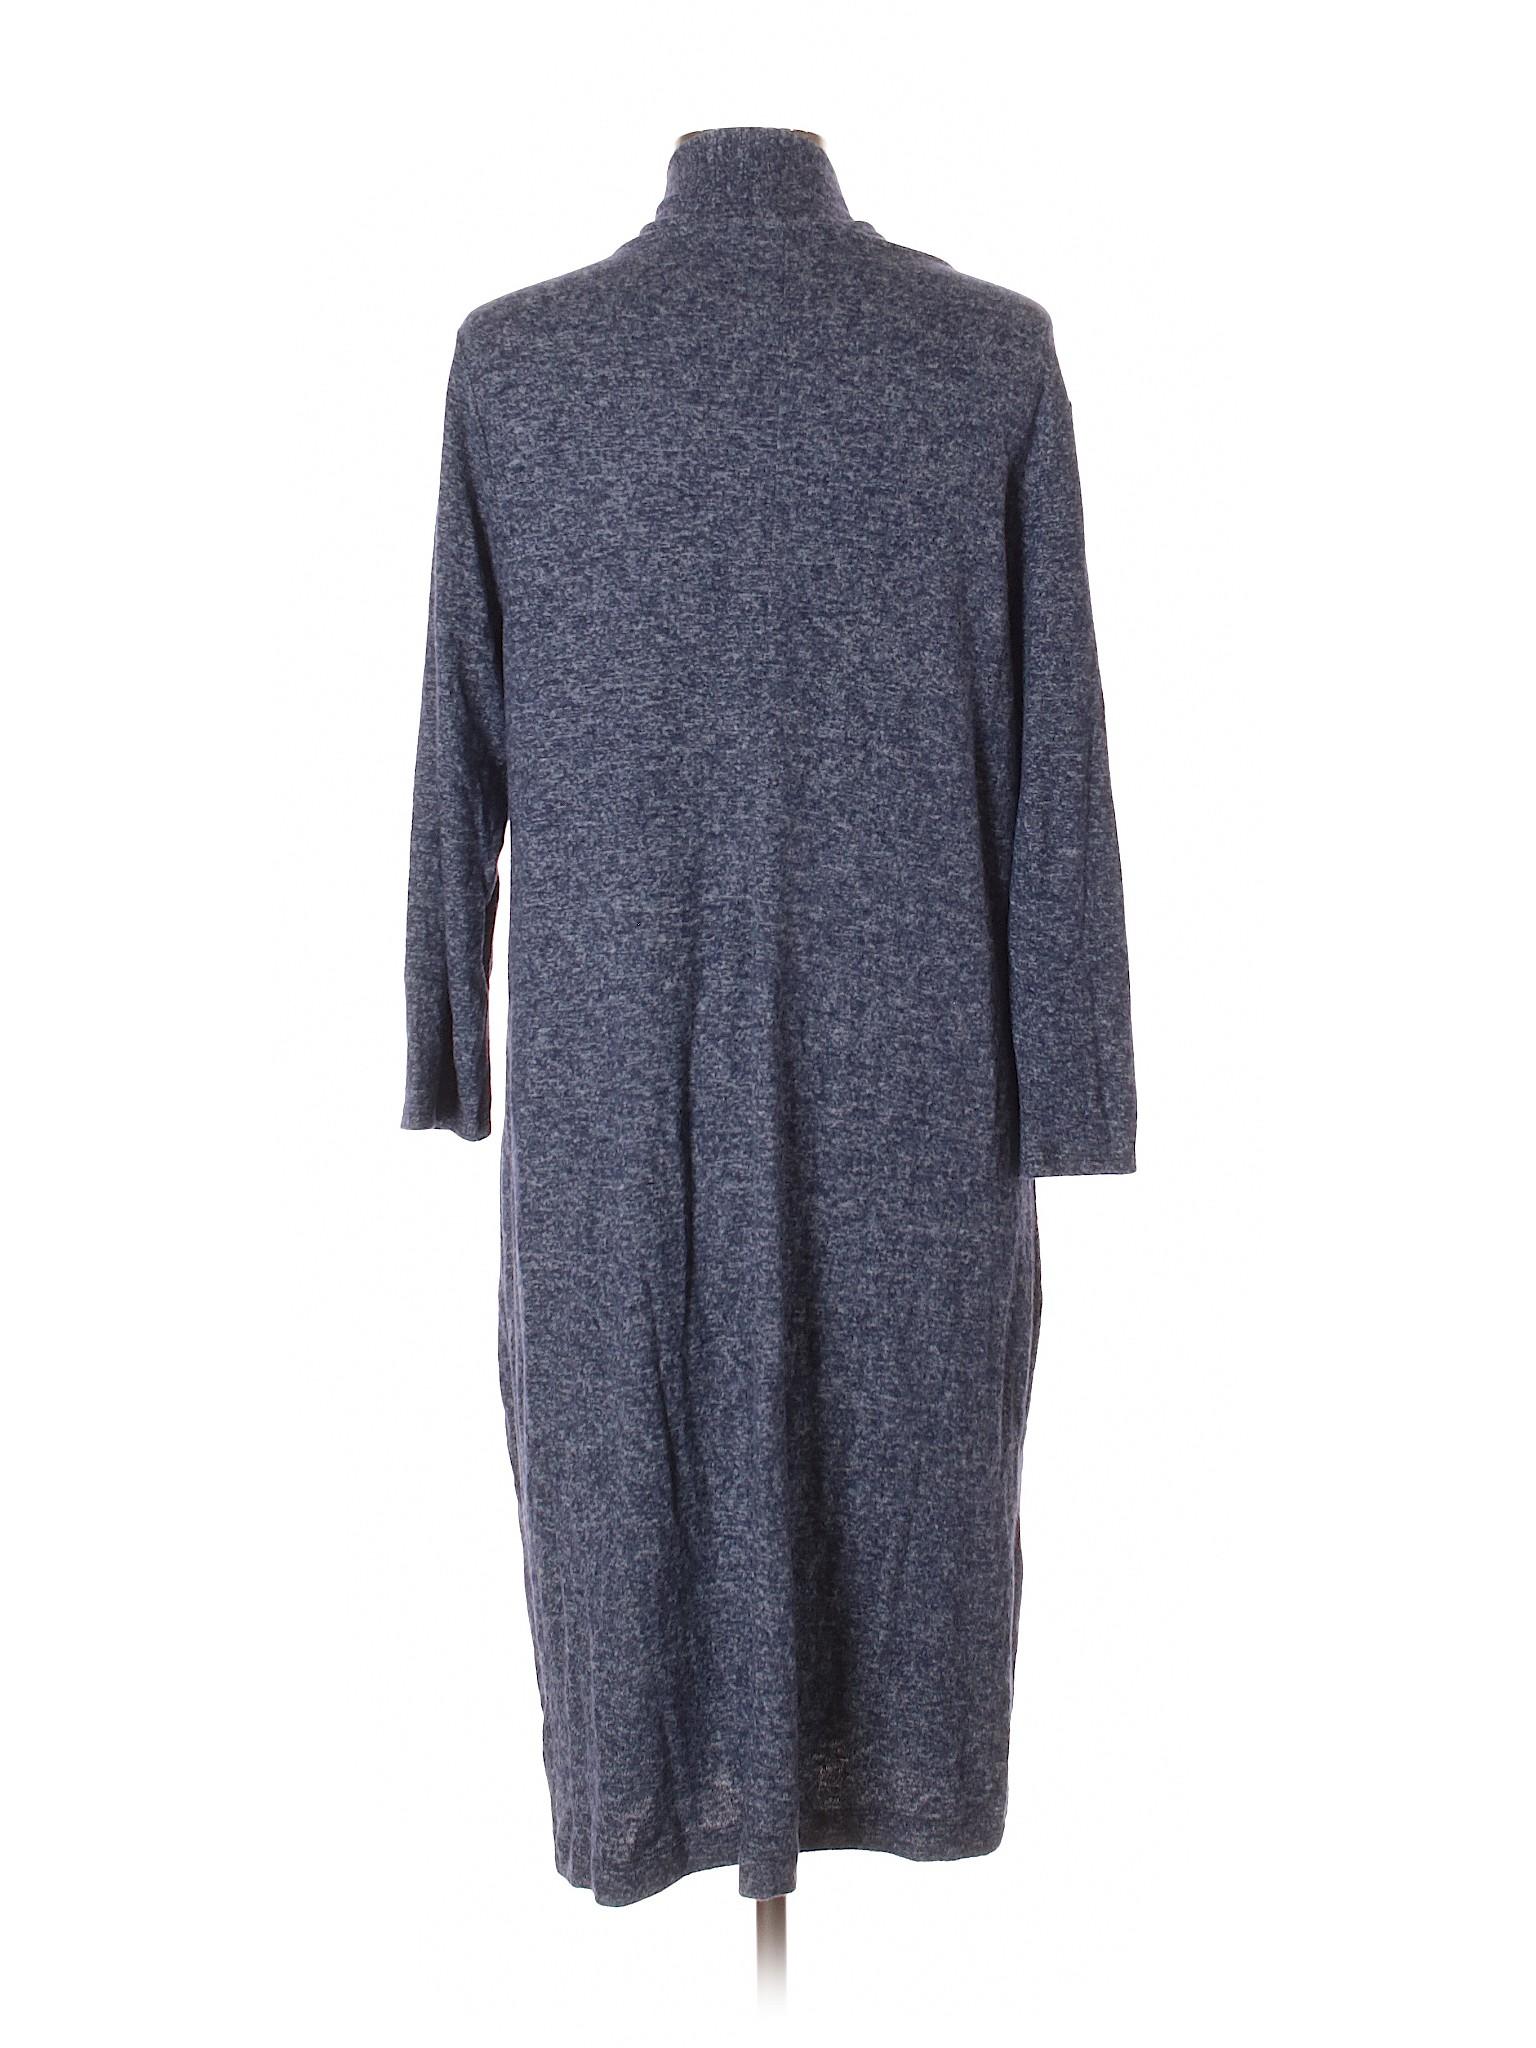 Boutique Dress Boutique Gap Casual winter winter 5X0fn44